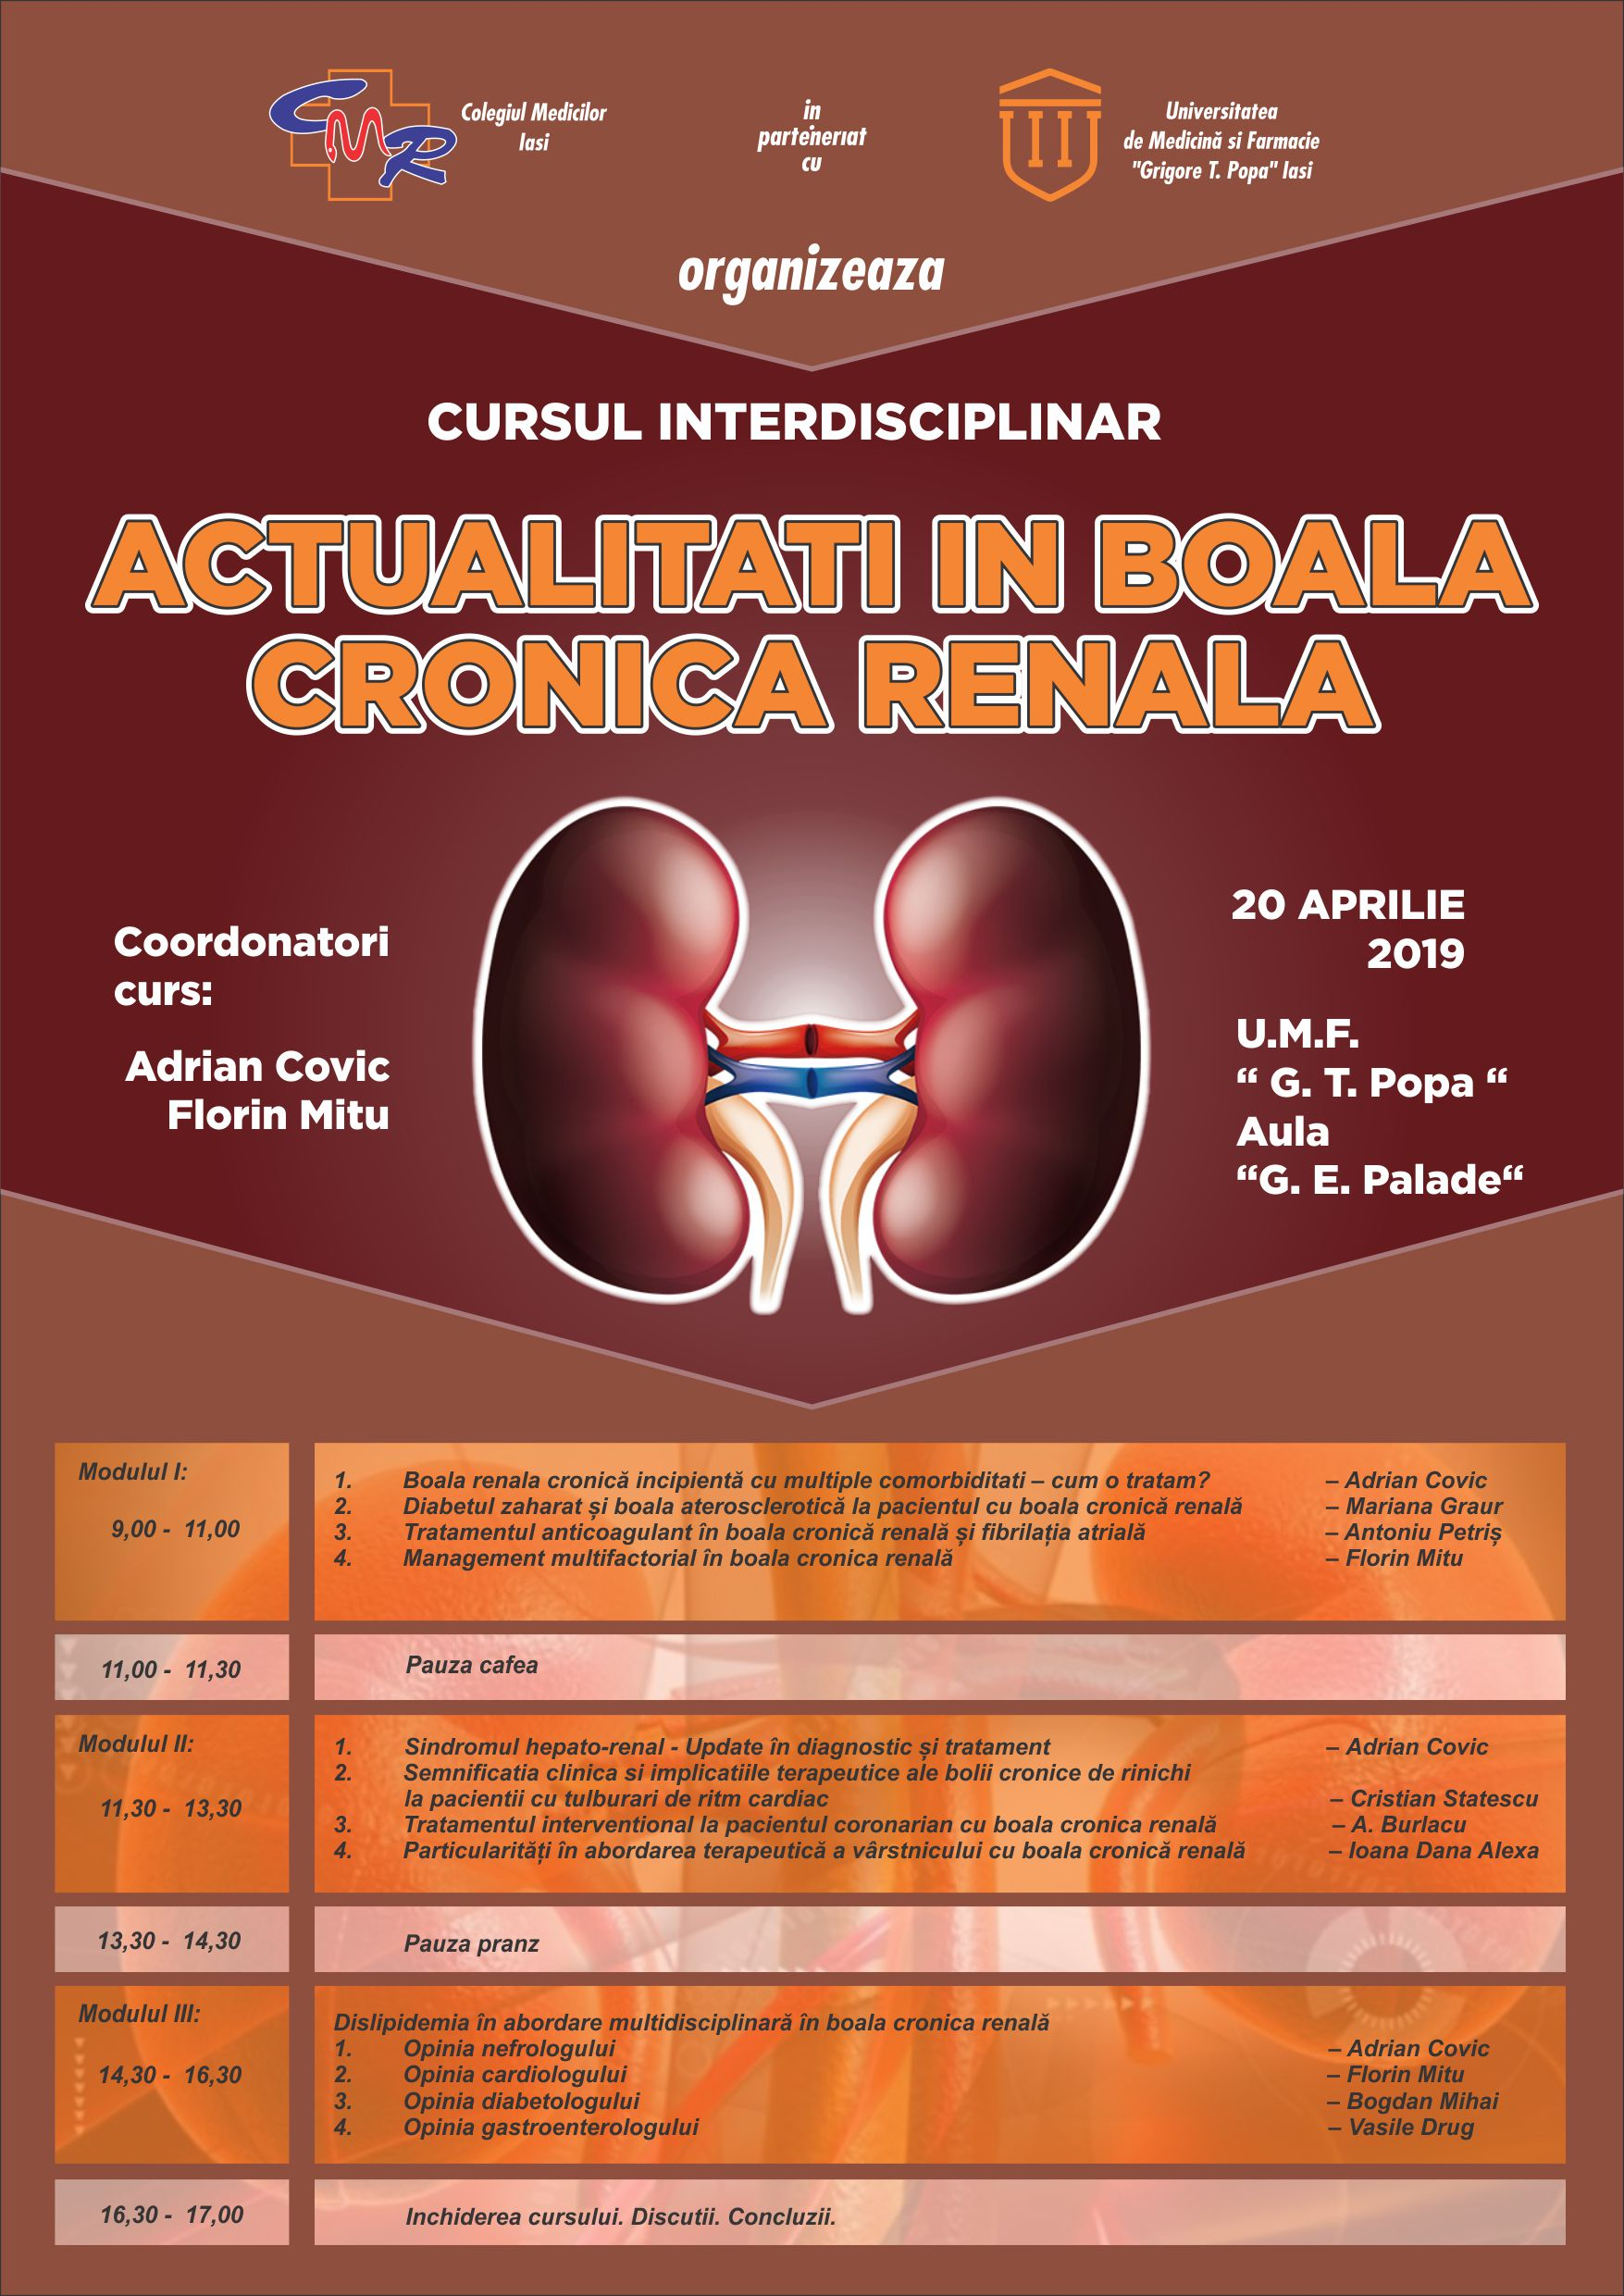 Cursul interdisciplinar – Actualitati in boala cronica renala – 20 Aprilie 2019